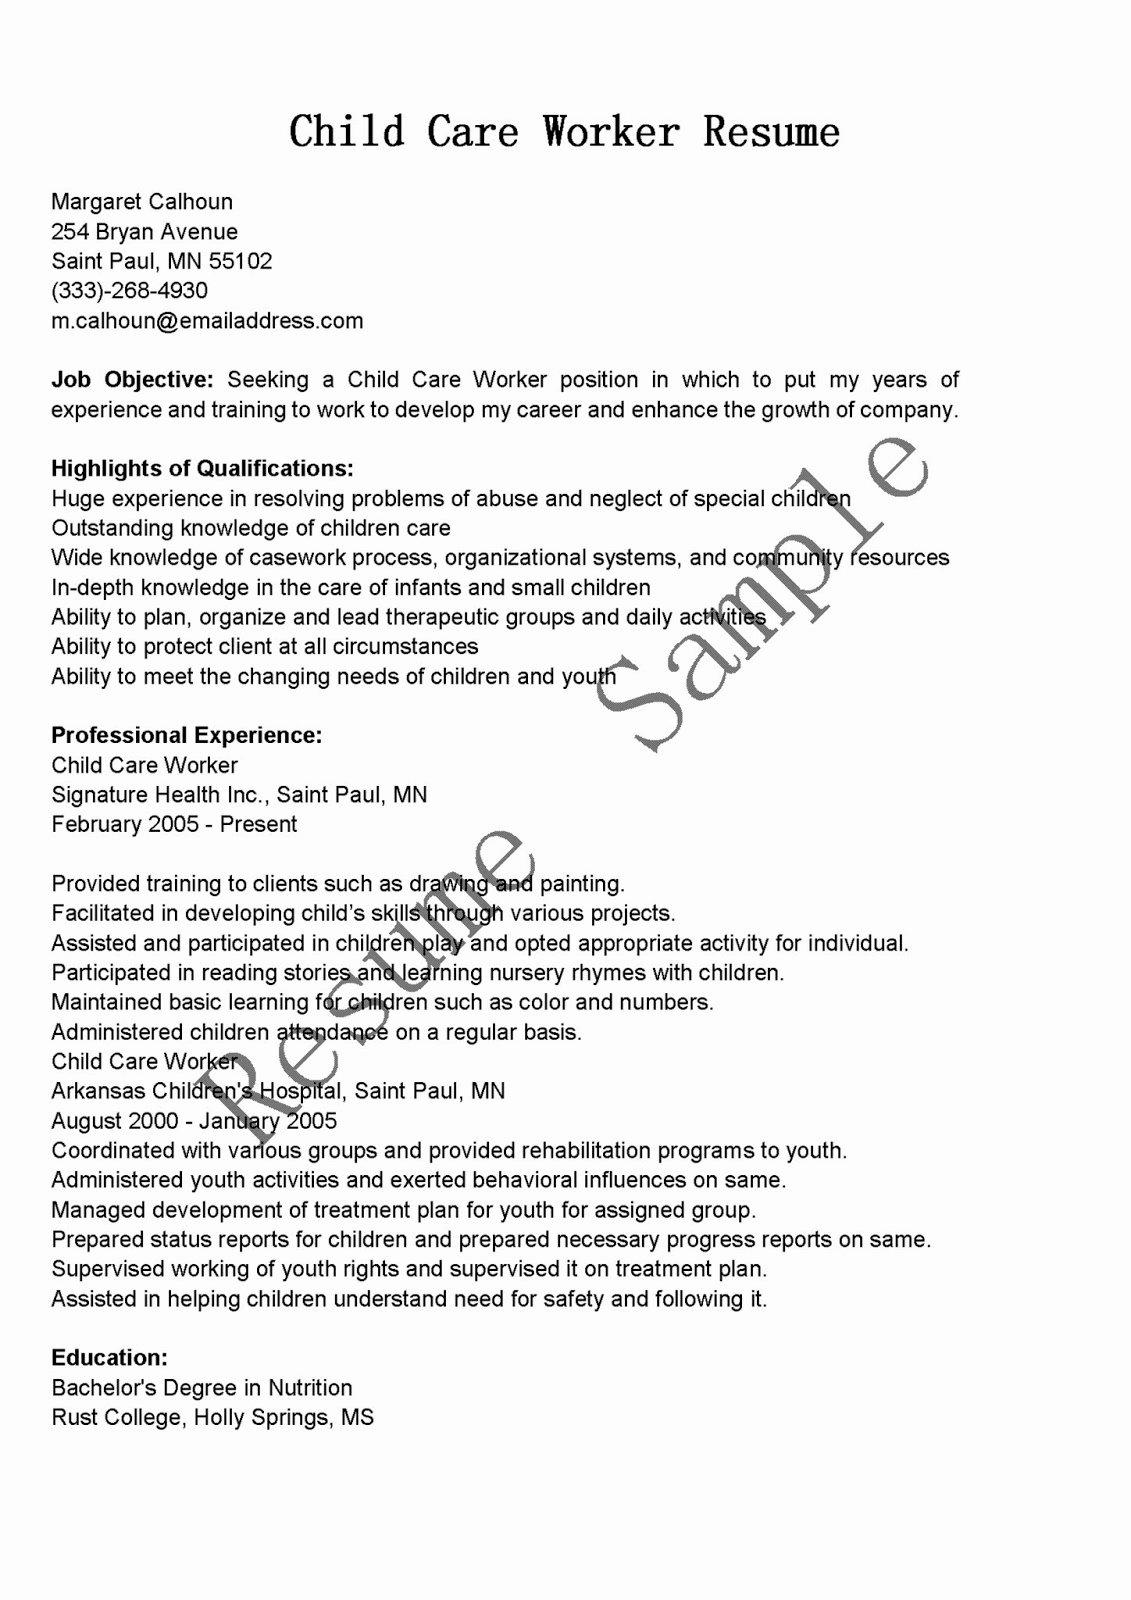 Resume Samples Child Care Worker Resume Sample